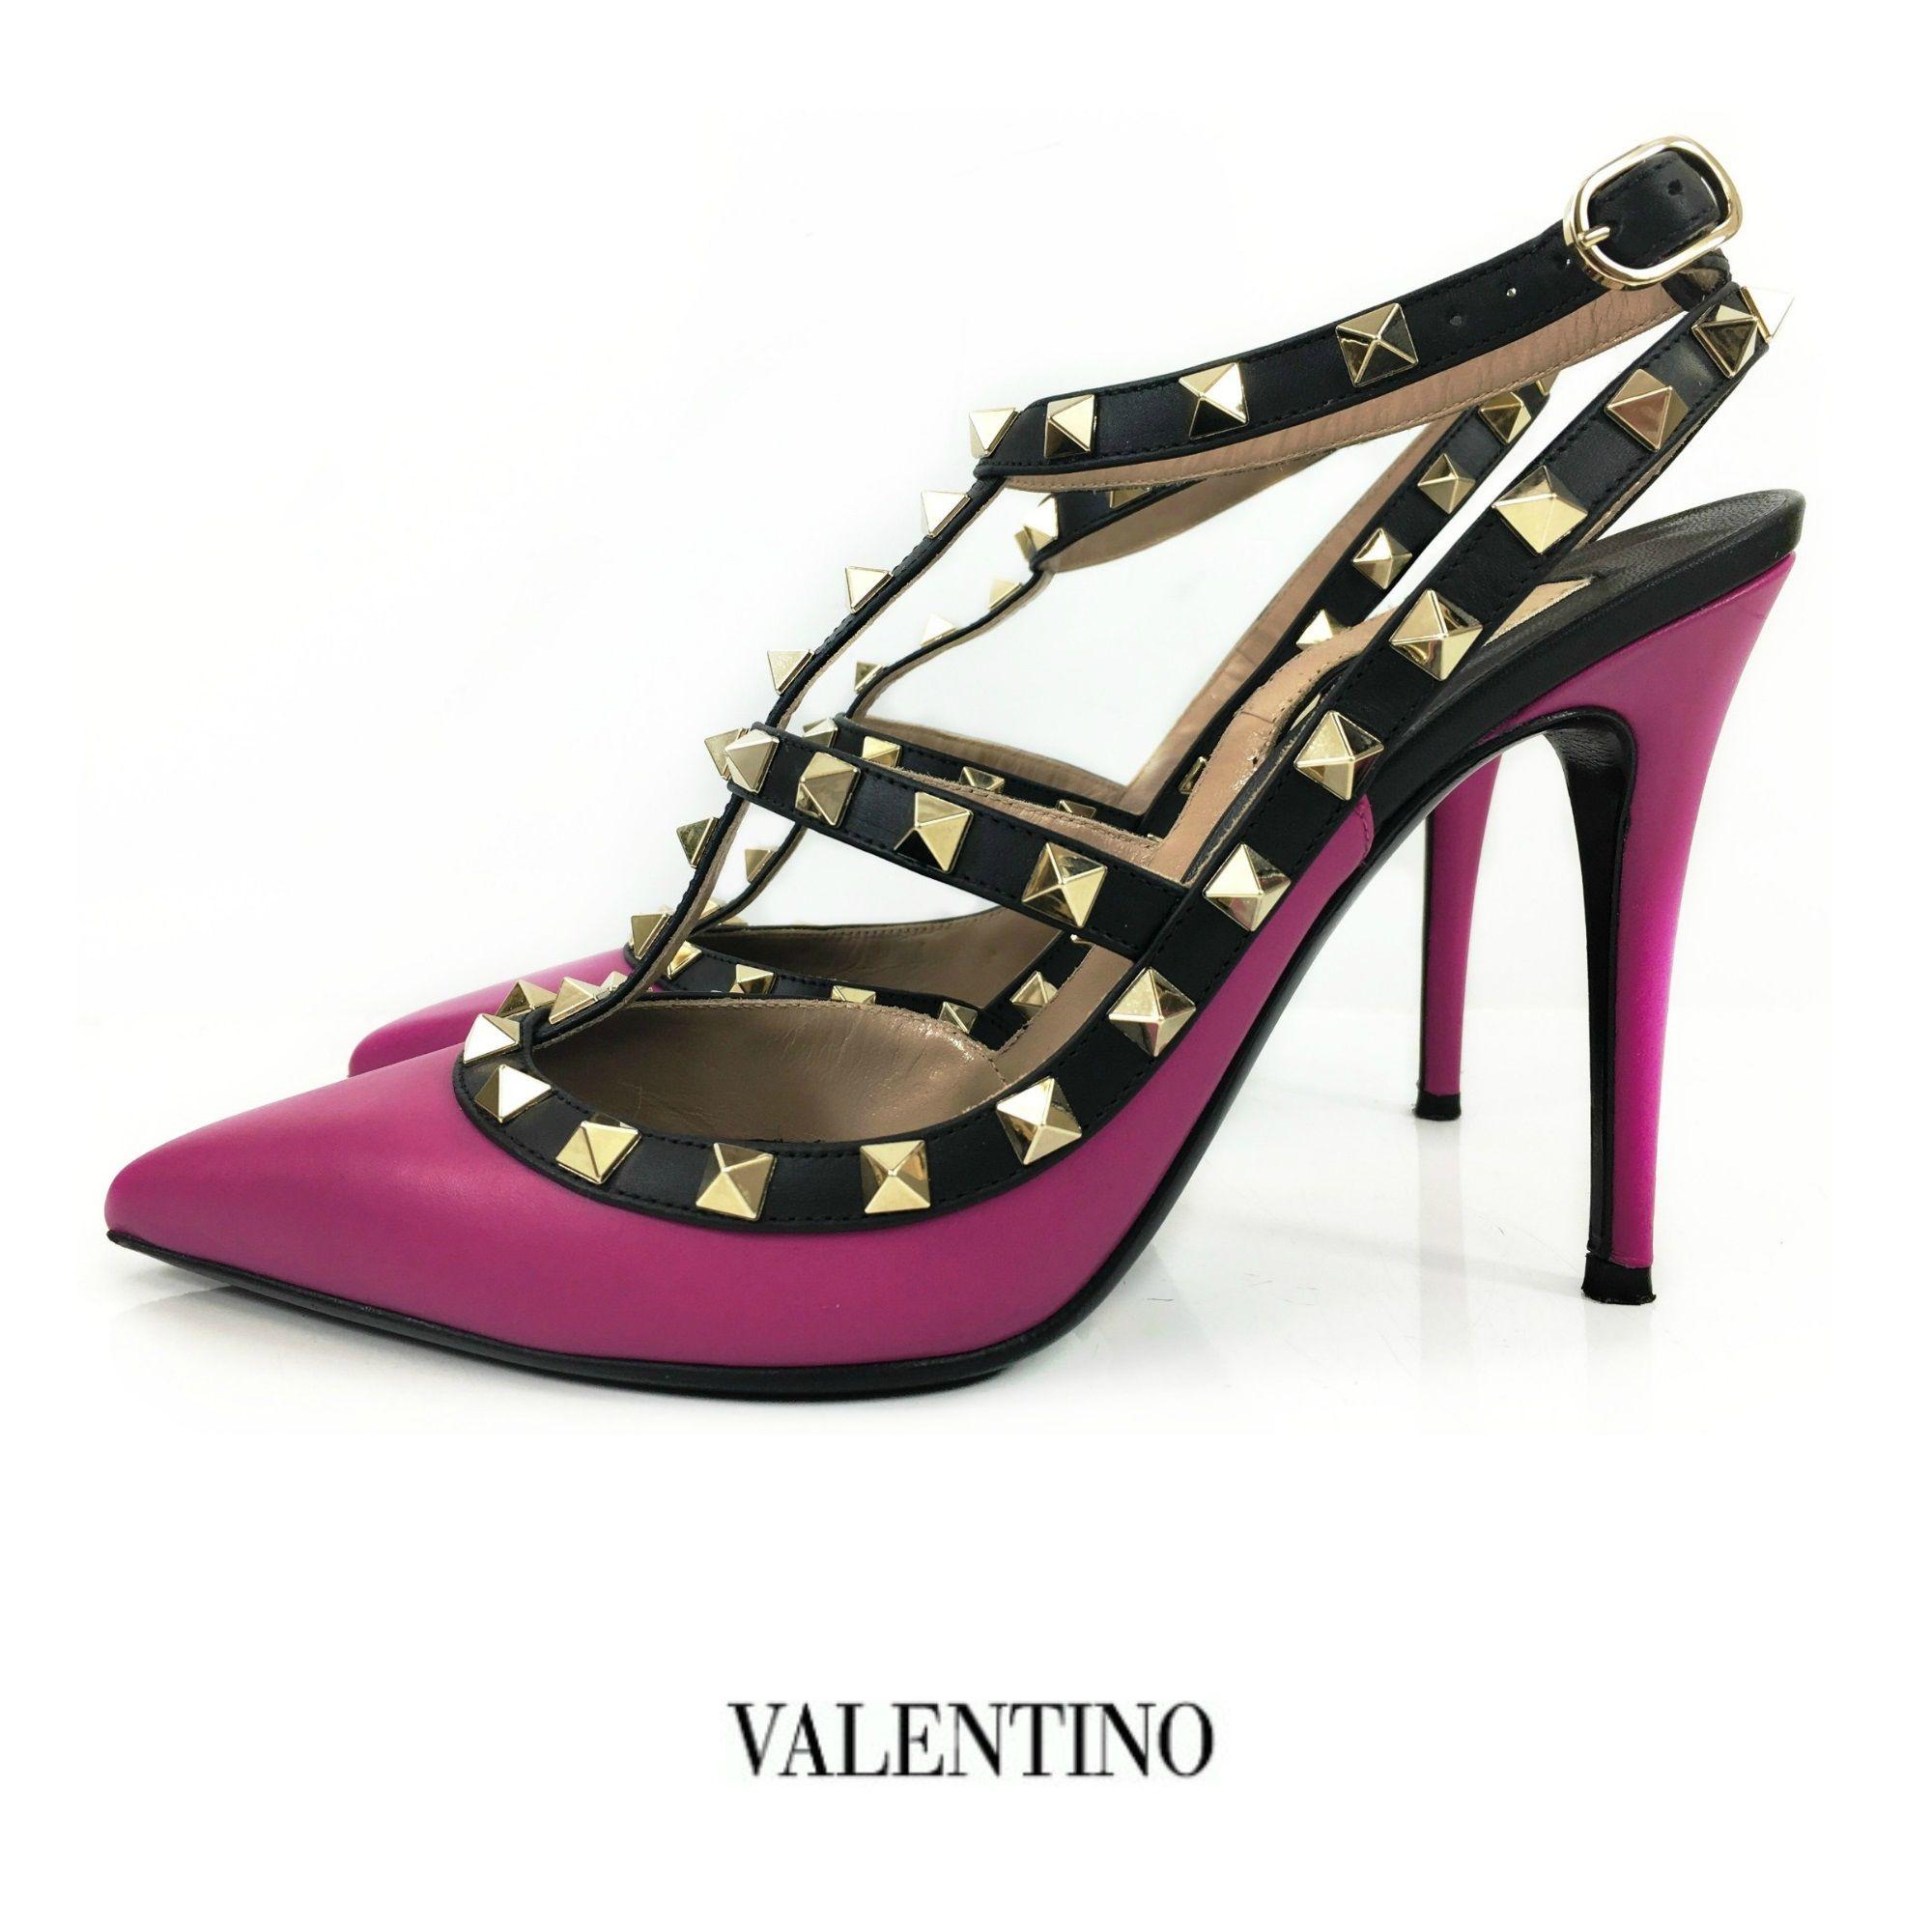 db11a67cc7f Valentino Pink Leather